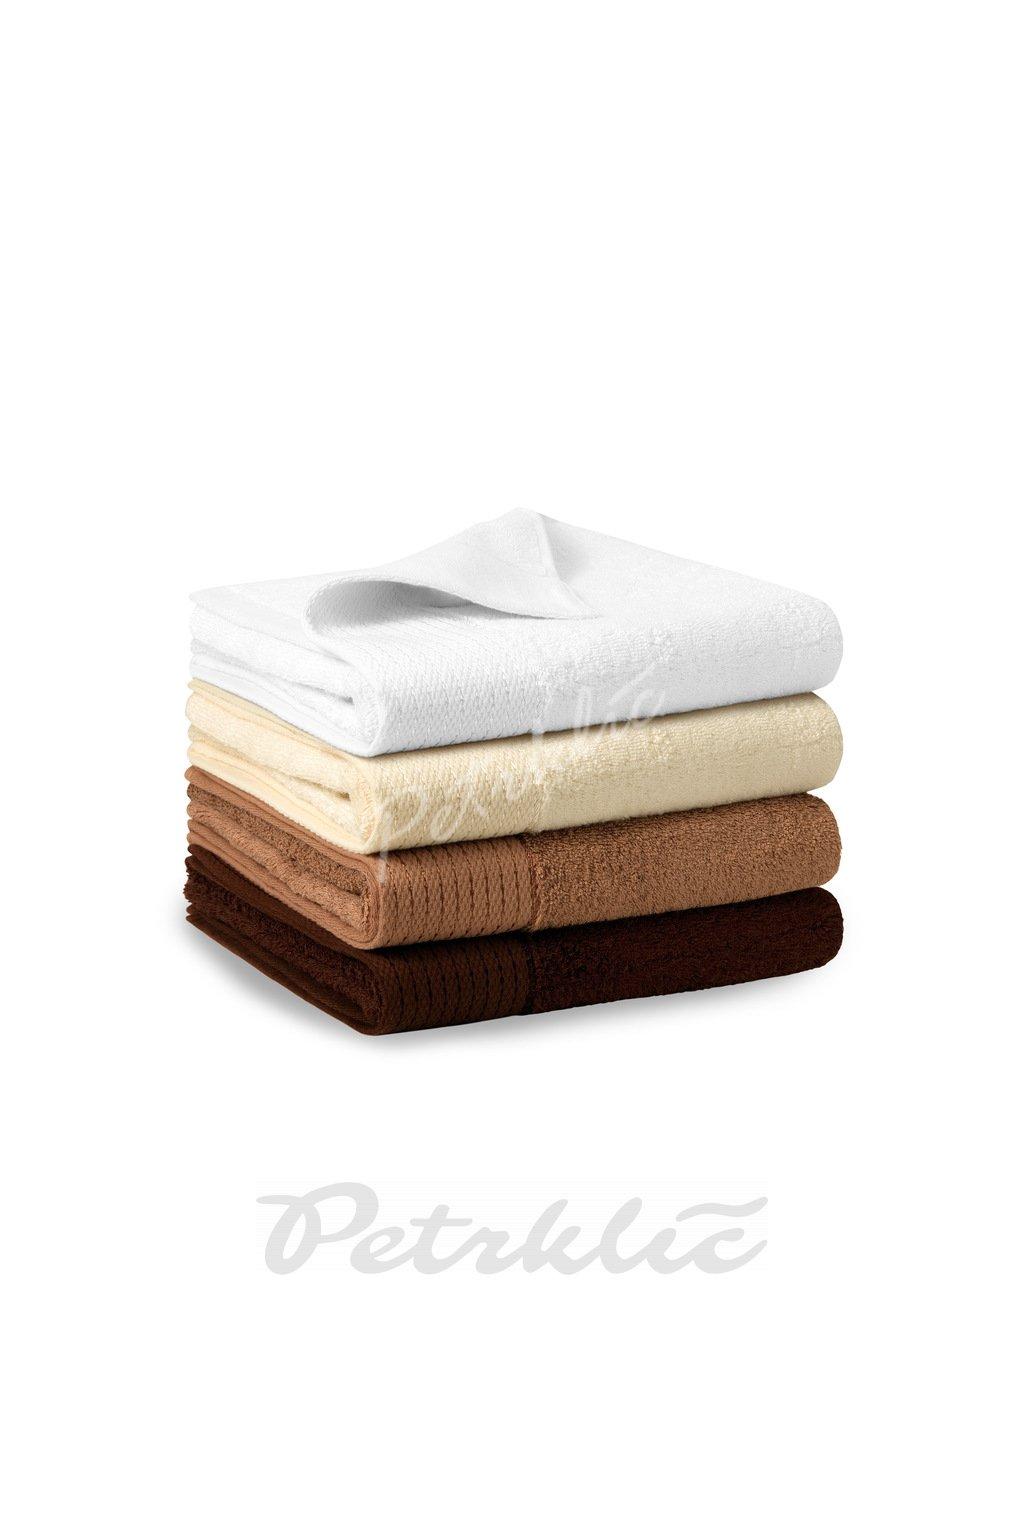 Bamboo - malý ručník 950 30 x 50 cm